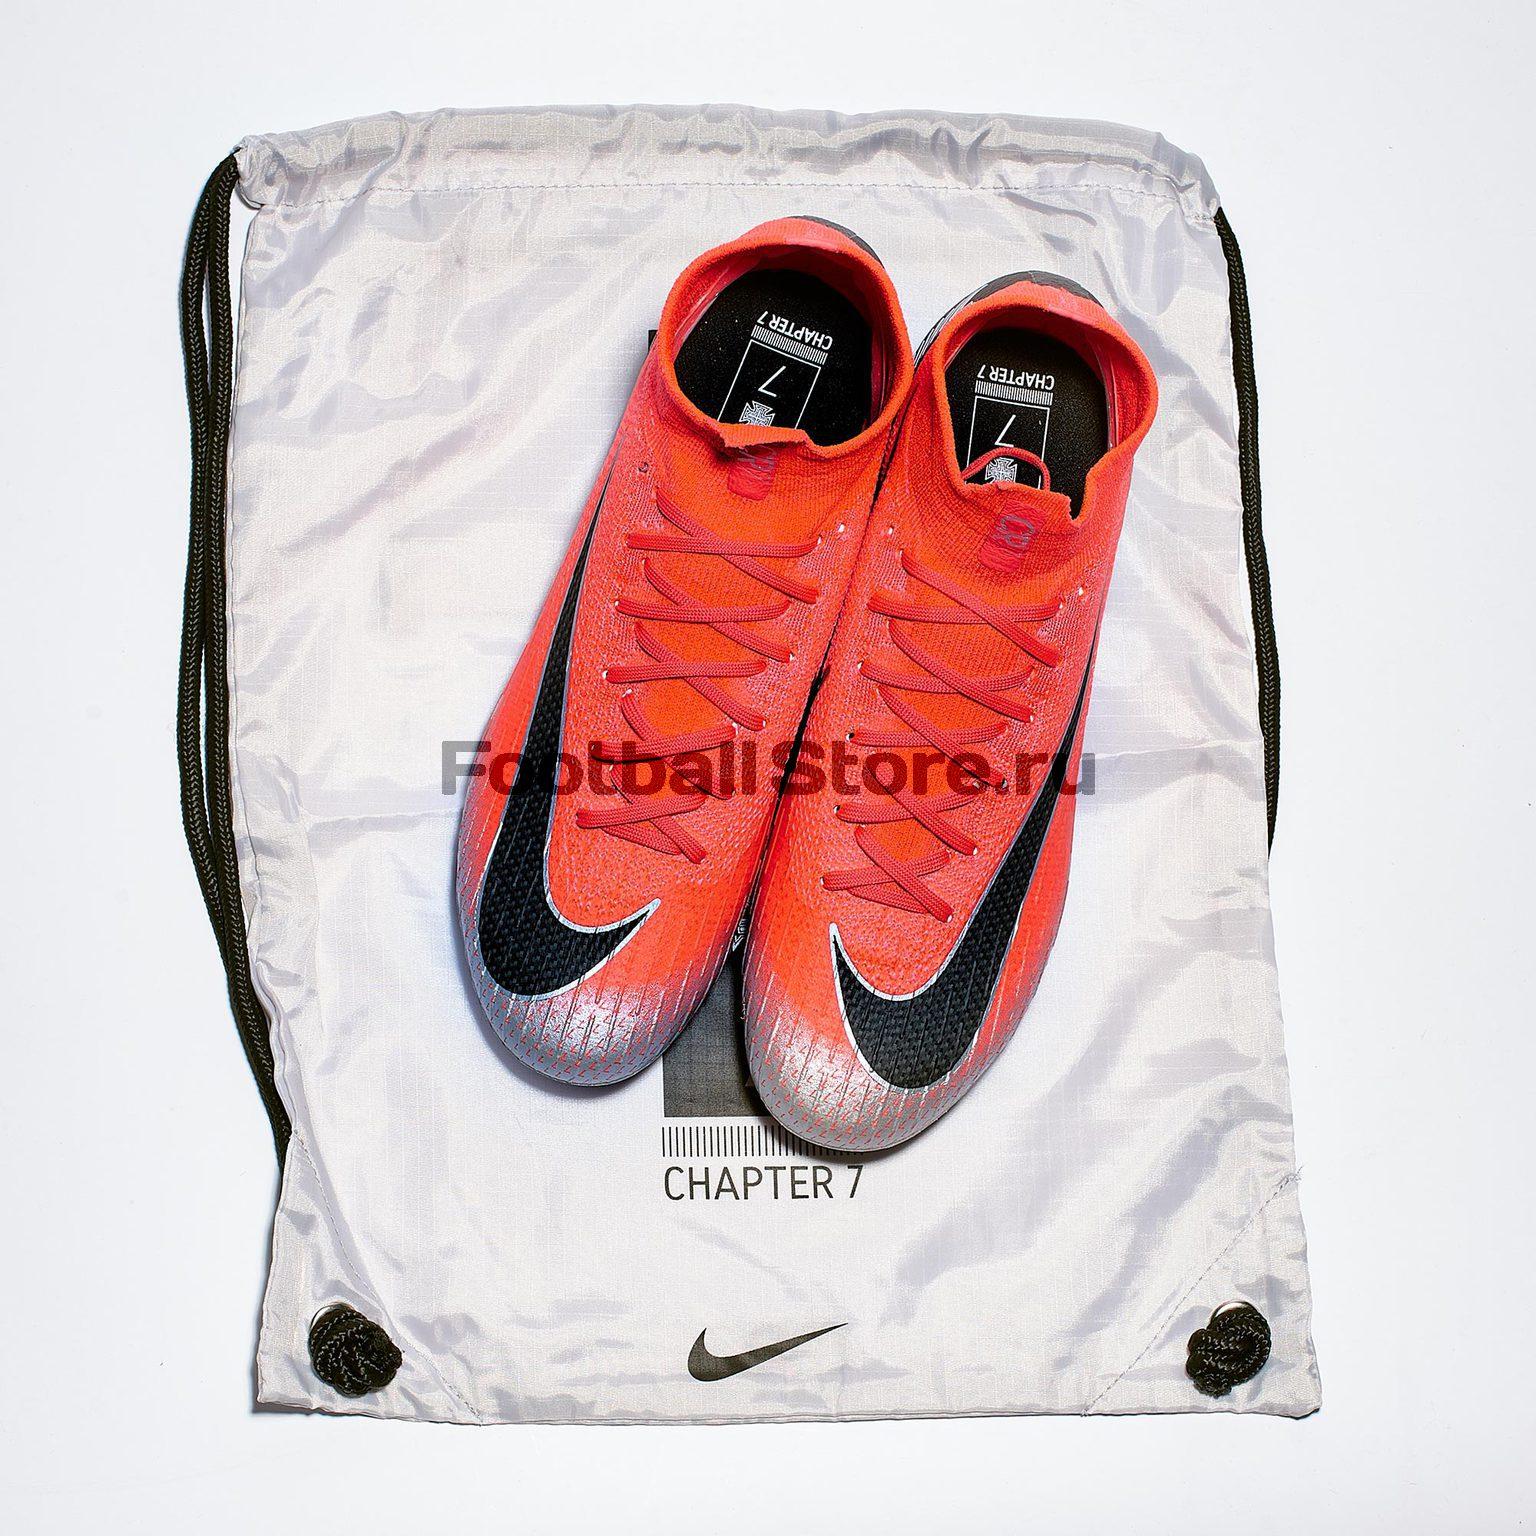 718bae28 Бутсы Nike Superfly 6 Elite CR7 FG AJ3547-600 – купить бутсы в ...